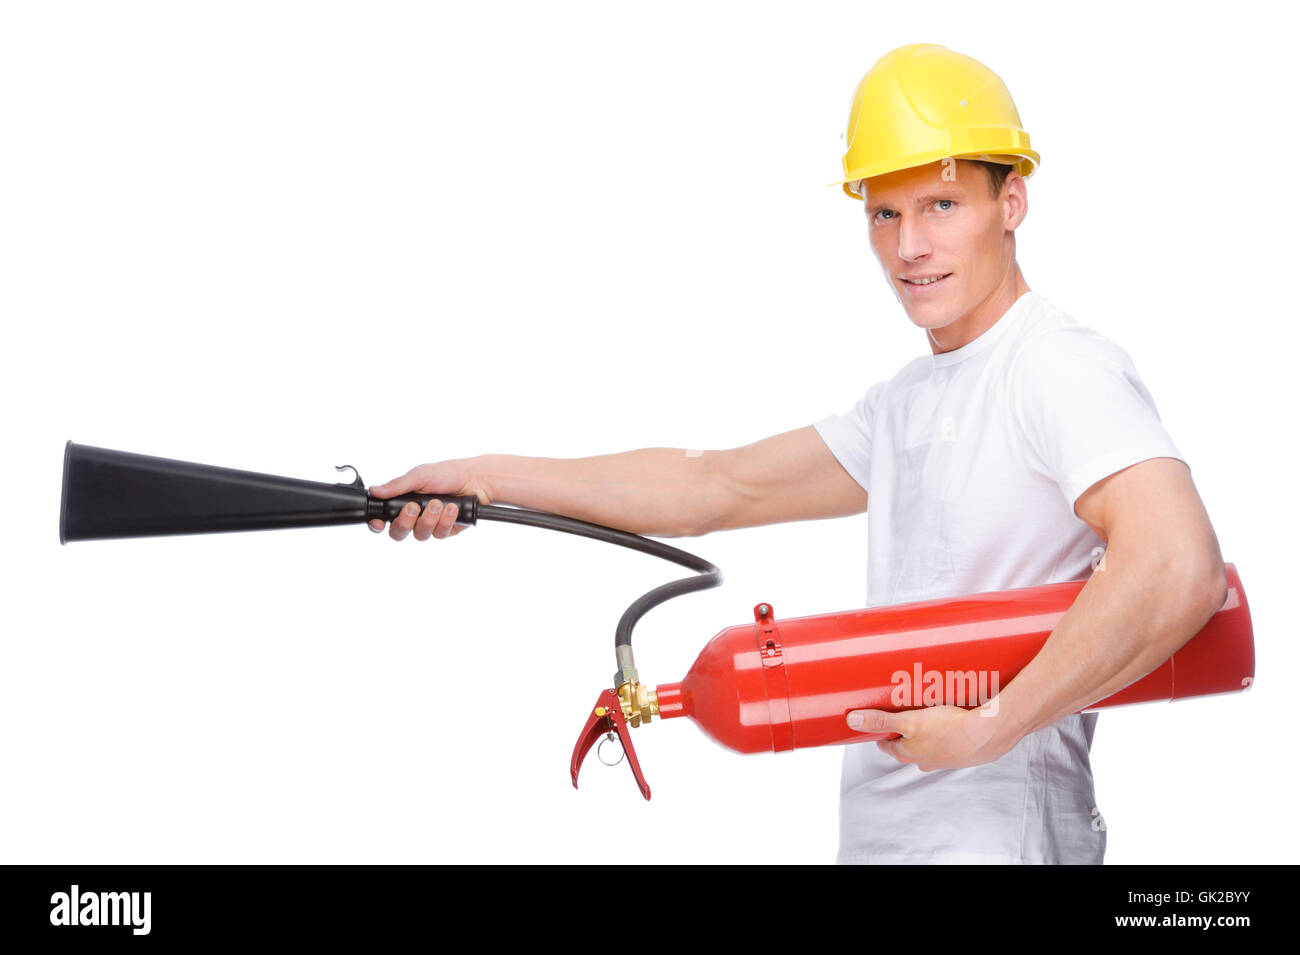 extinguish fire - Stock Image